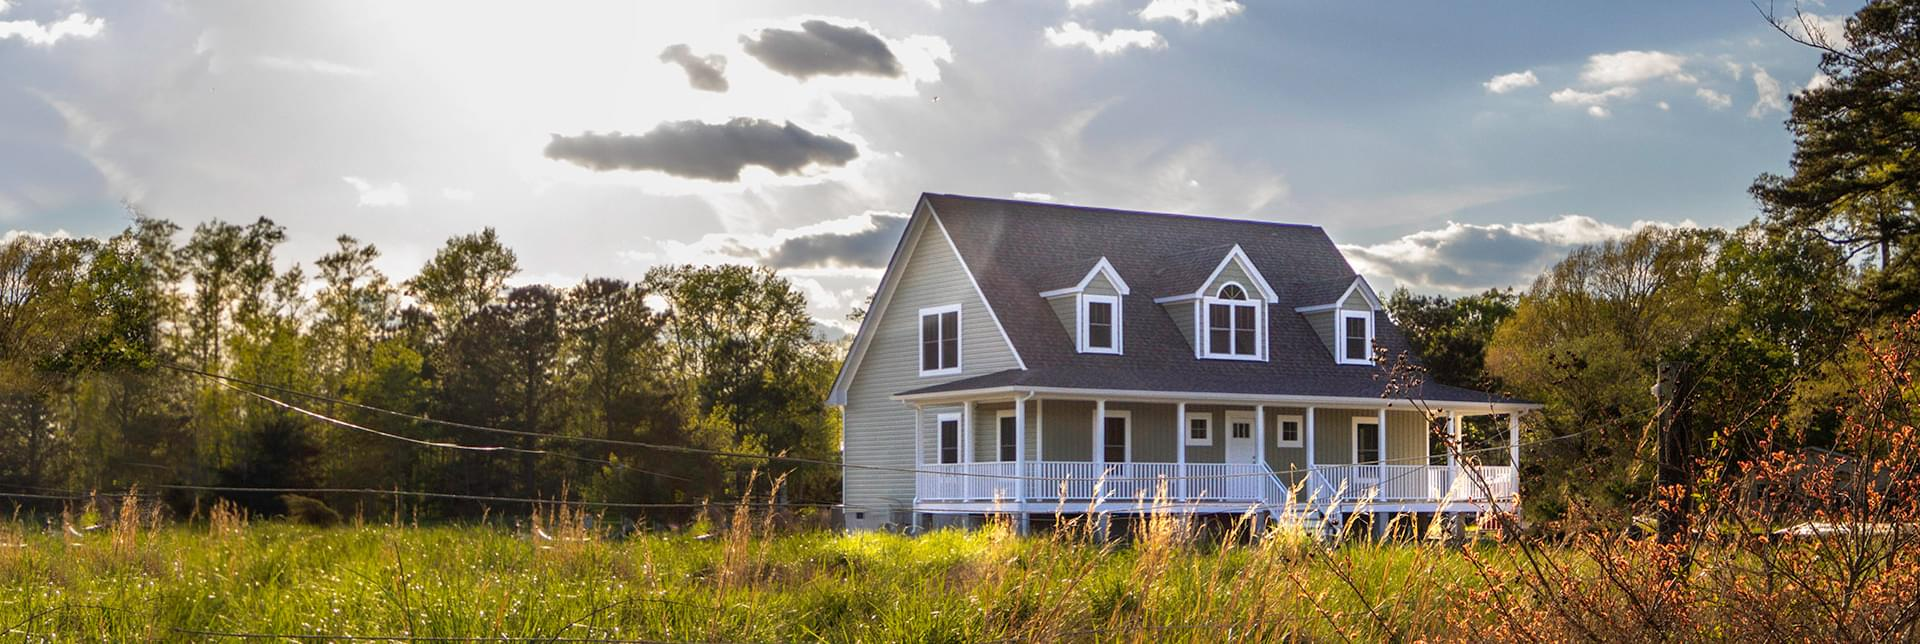 New Homes in Greene County NC